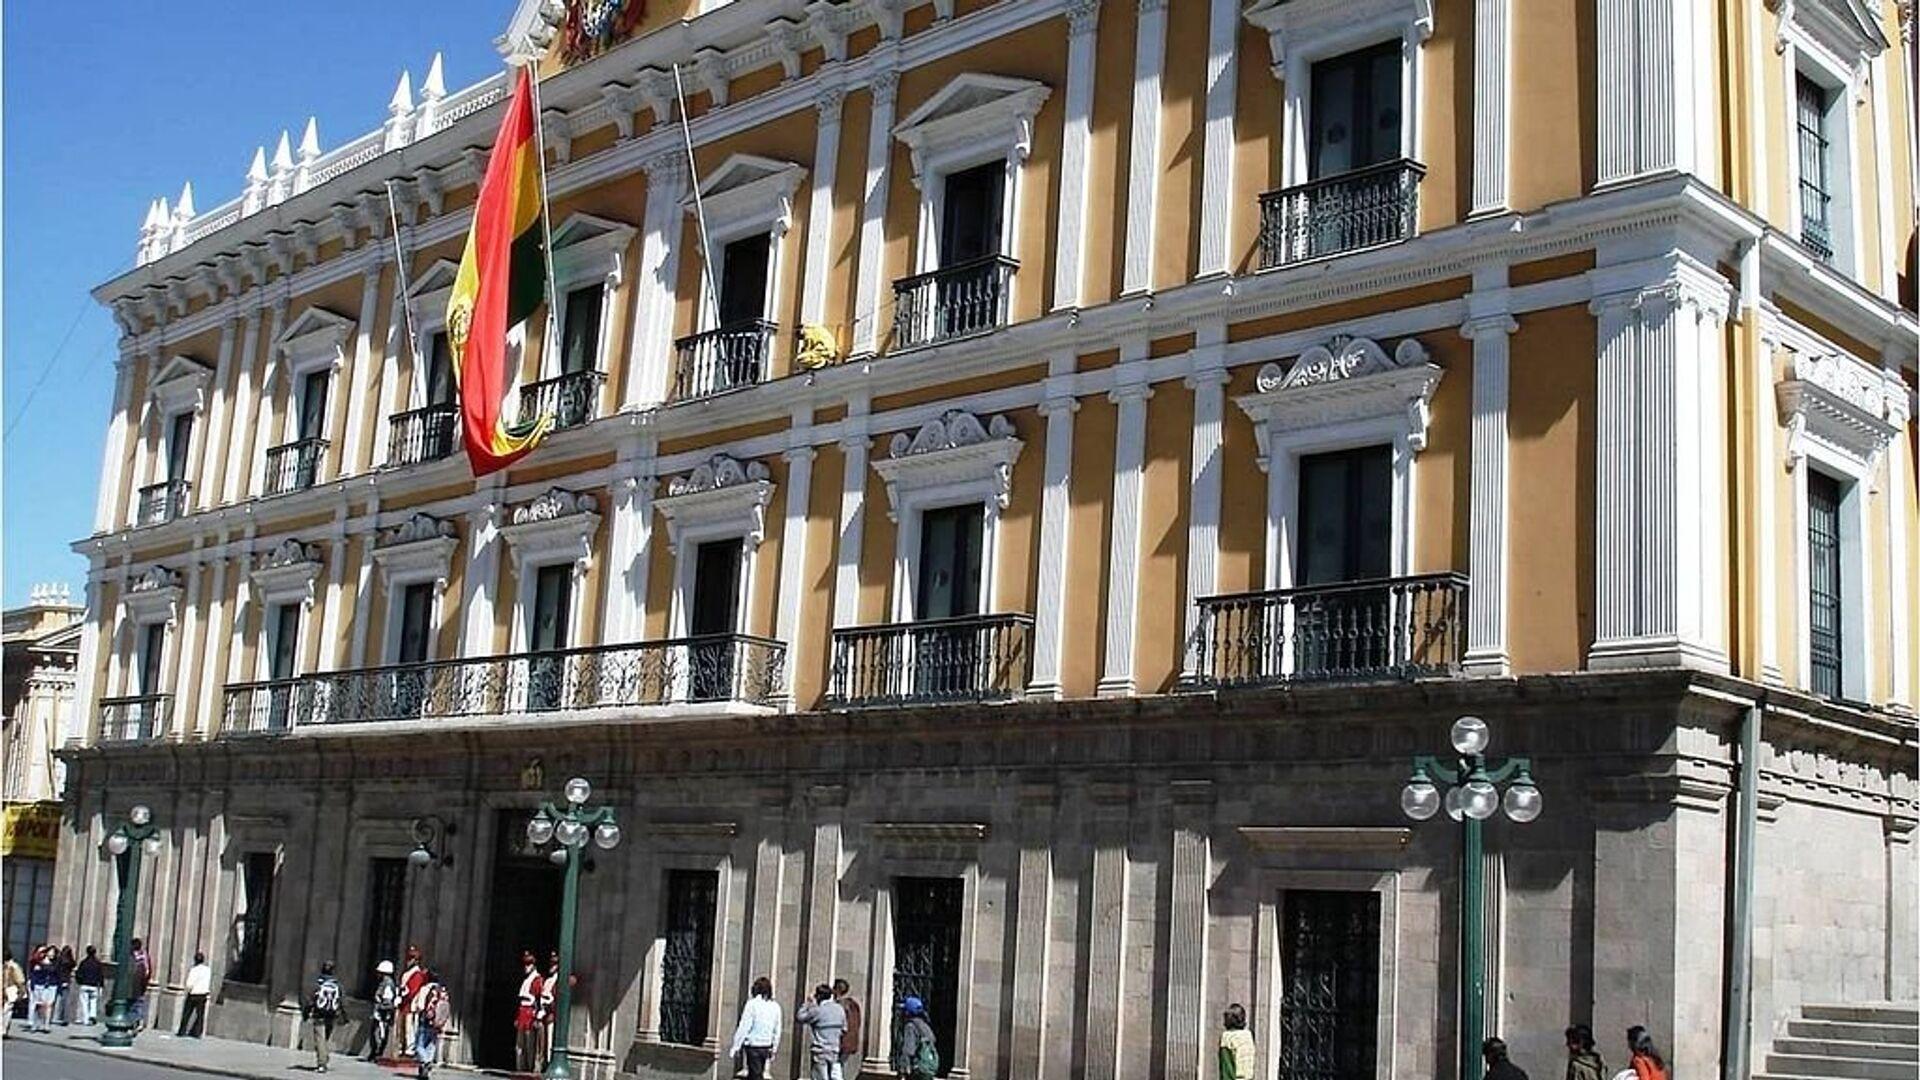 Palacio de Gobierno en La Paz, Bolivia. - Sputnik Mundo, 1920, 28.09.2021